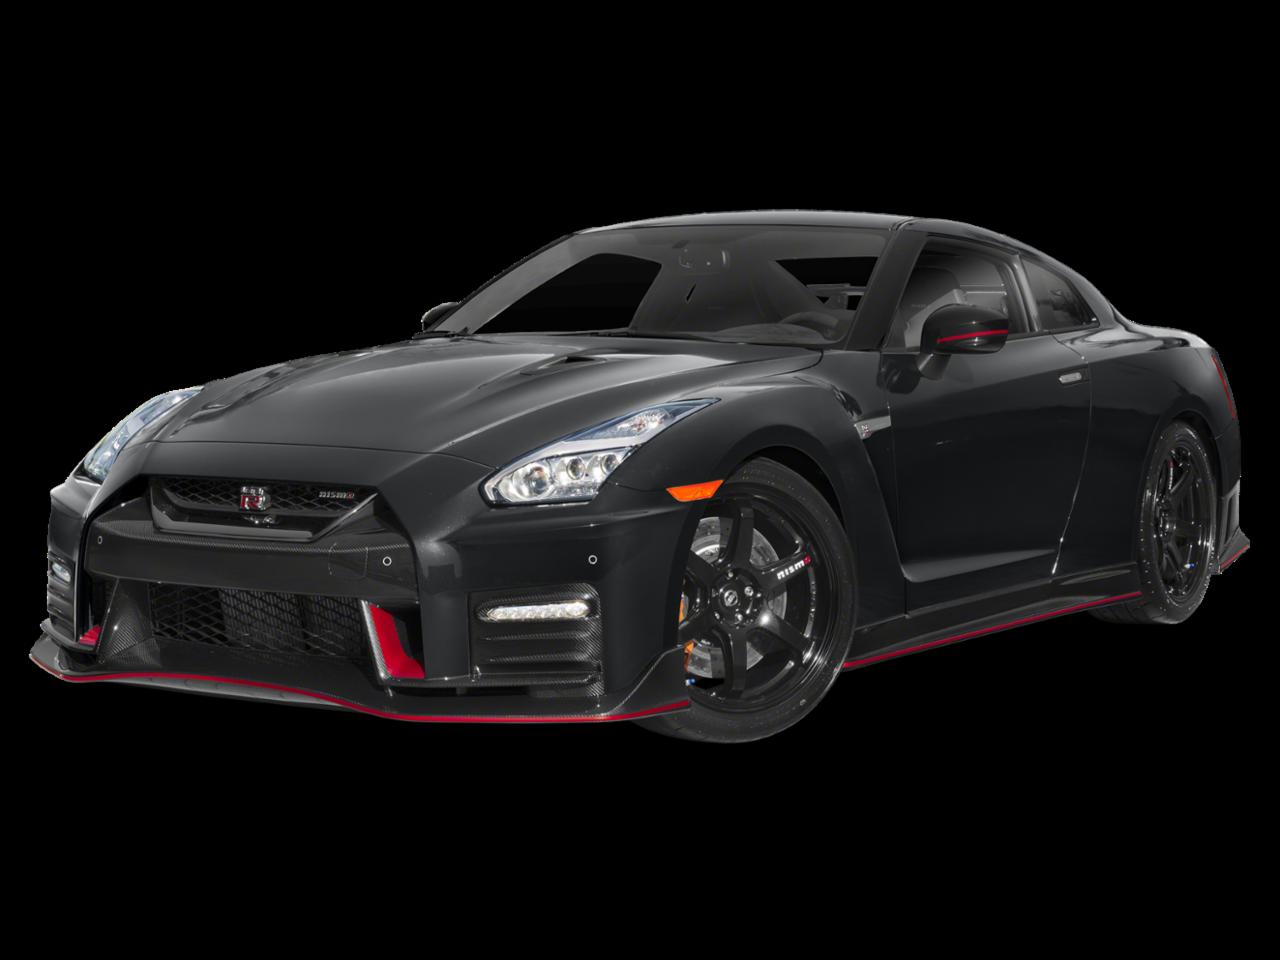 Nissan 2019 GT-R NISMO